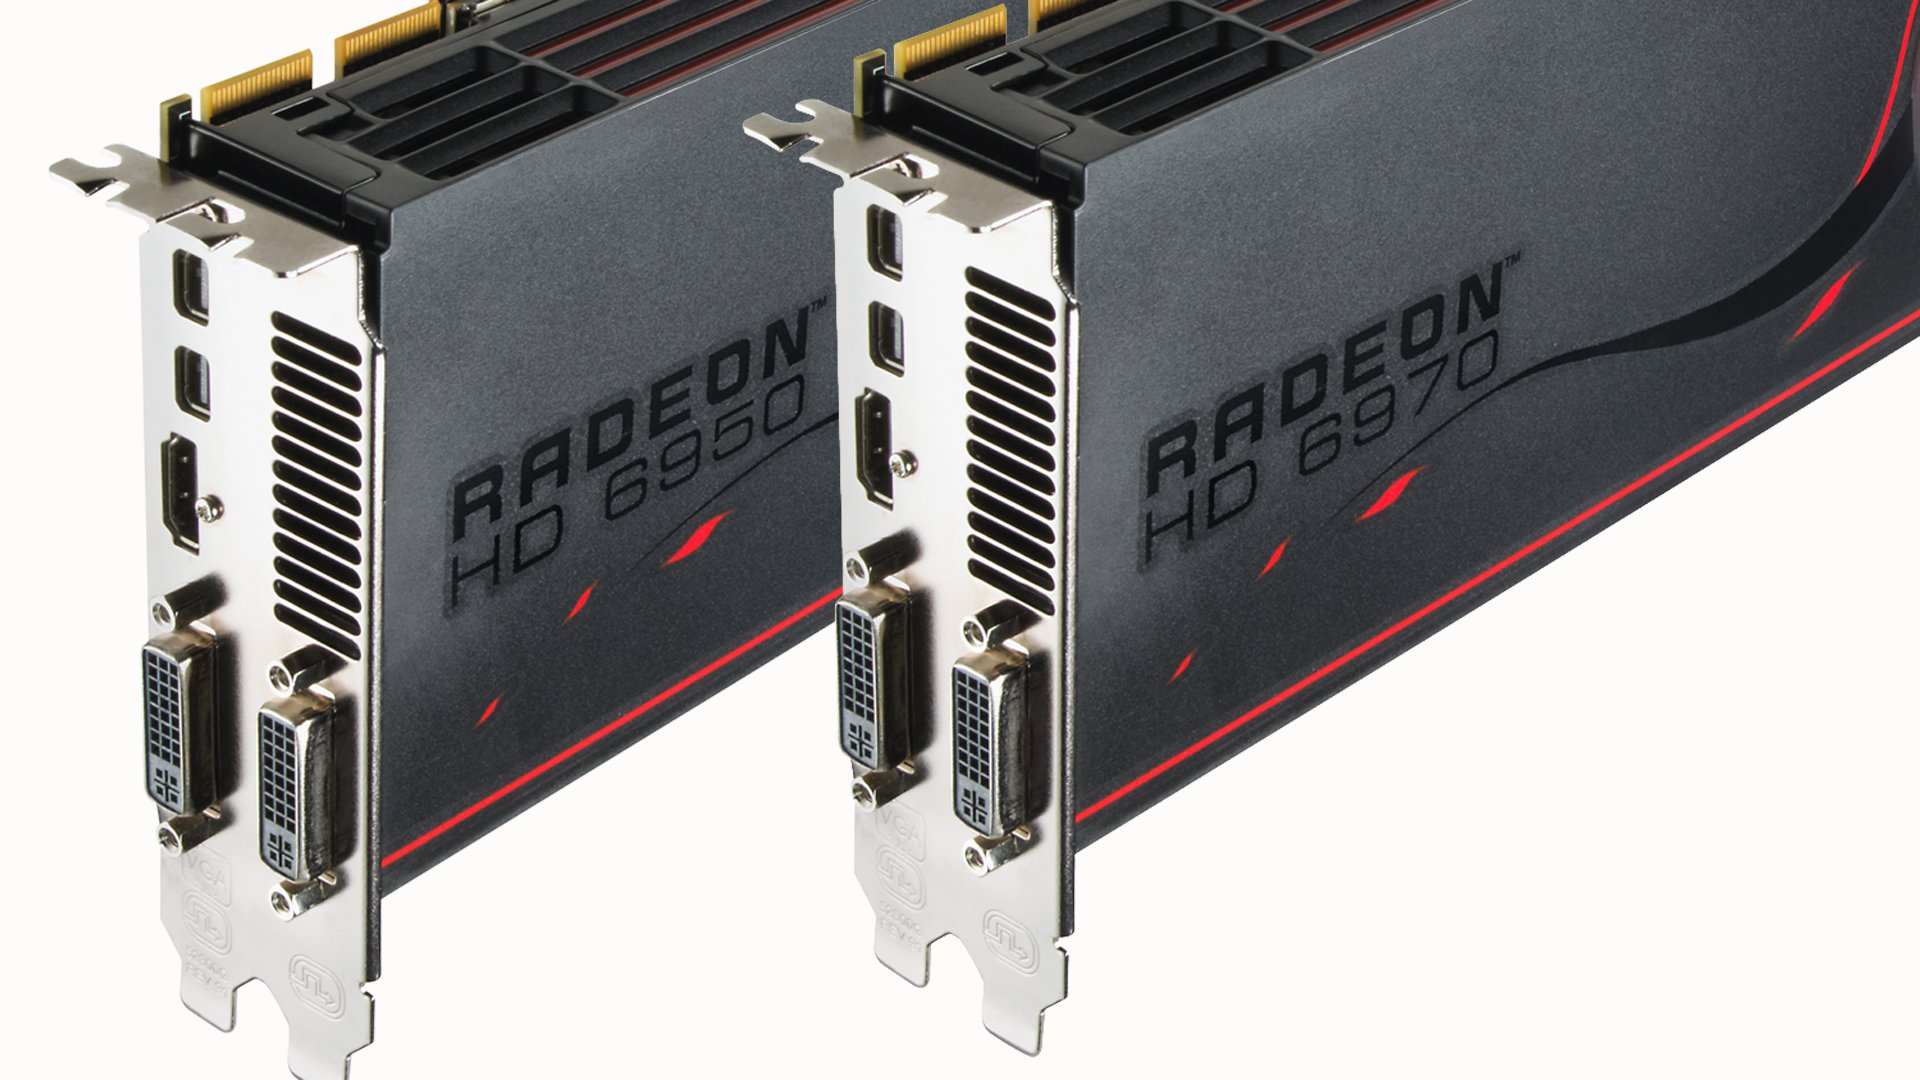 AMD Radeon HD 6950 & HD 6970